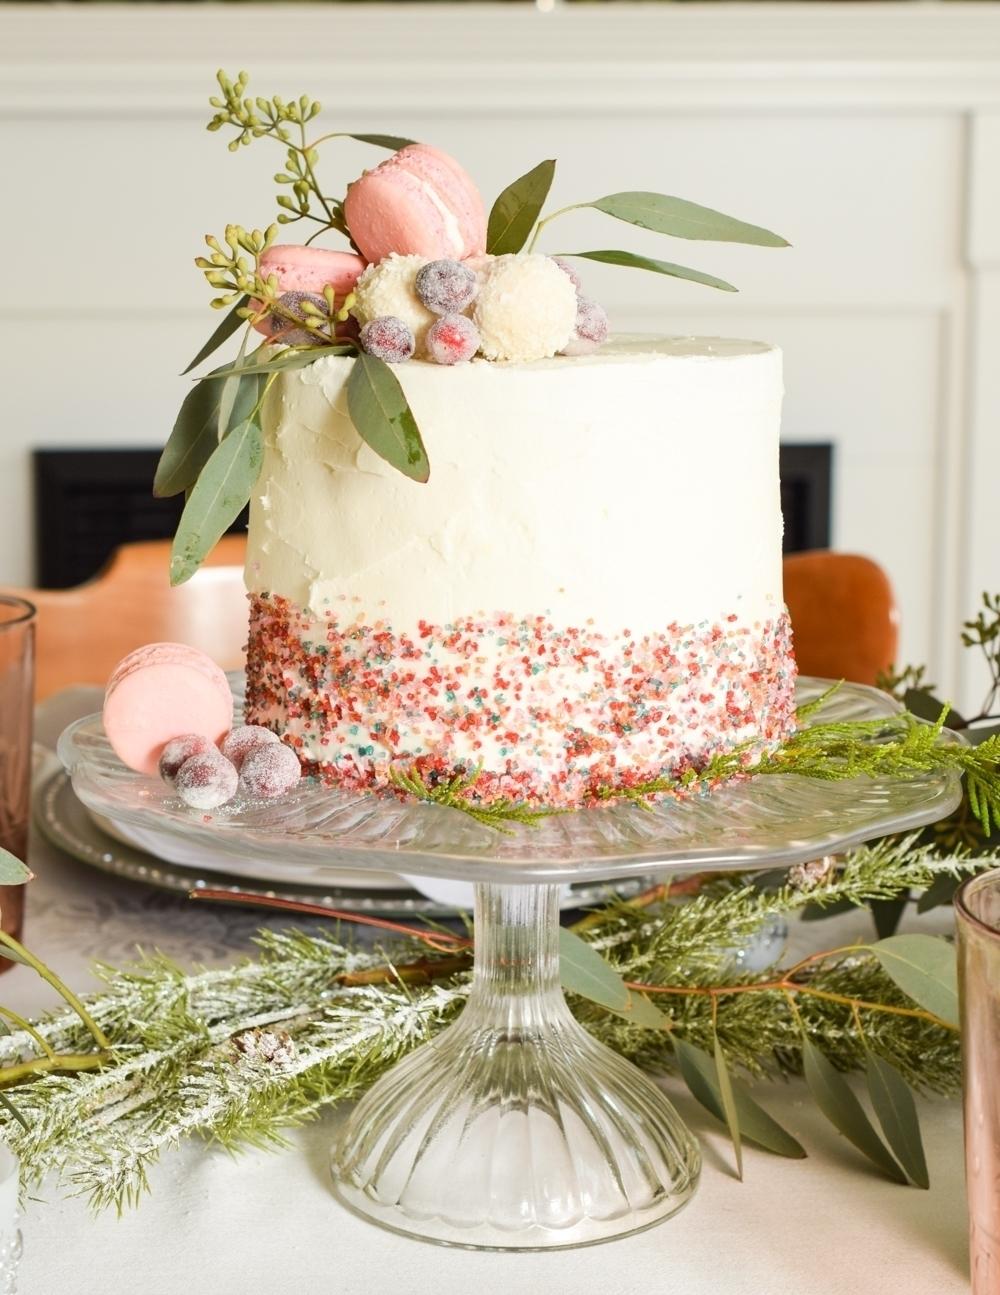 Festive Holiday Cake Centerpiece